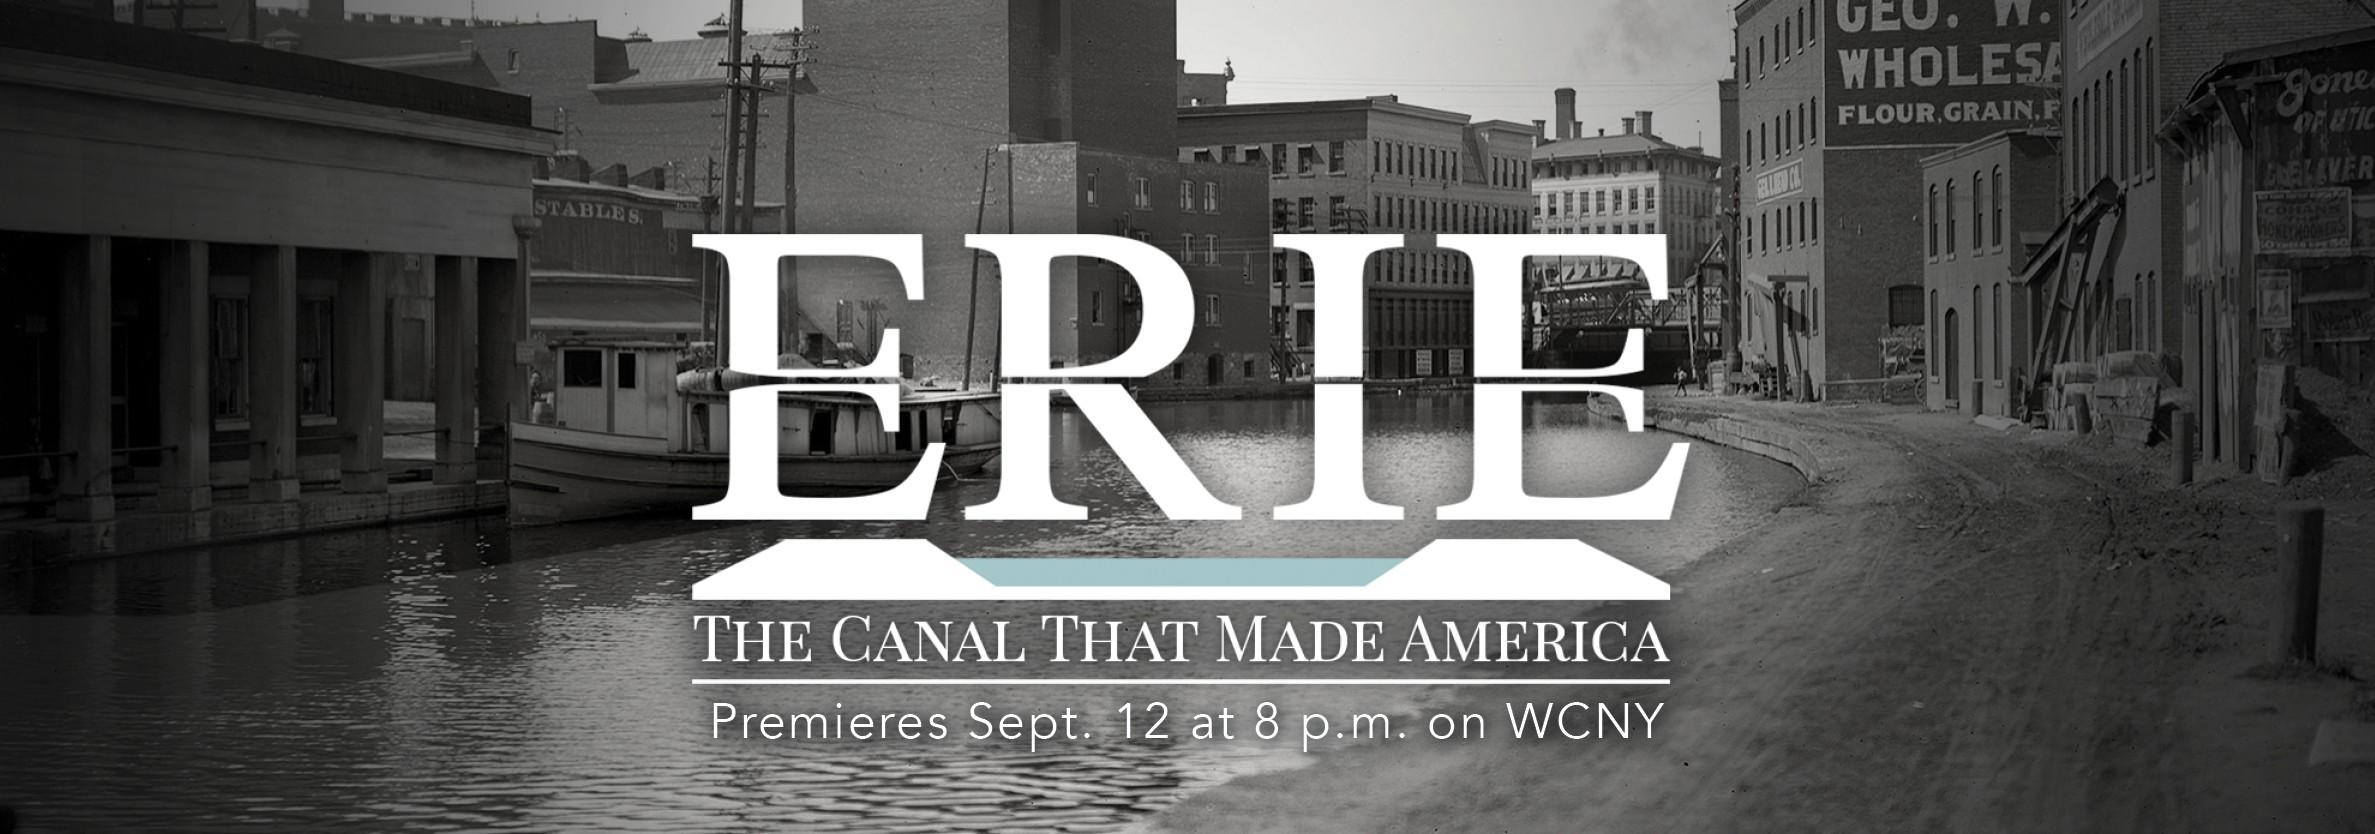 Erie Canal slider 2.2